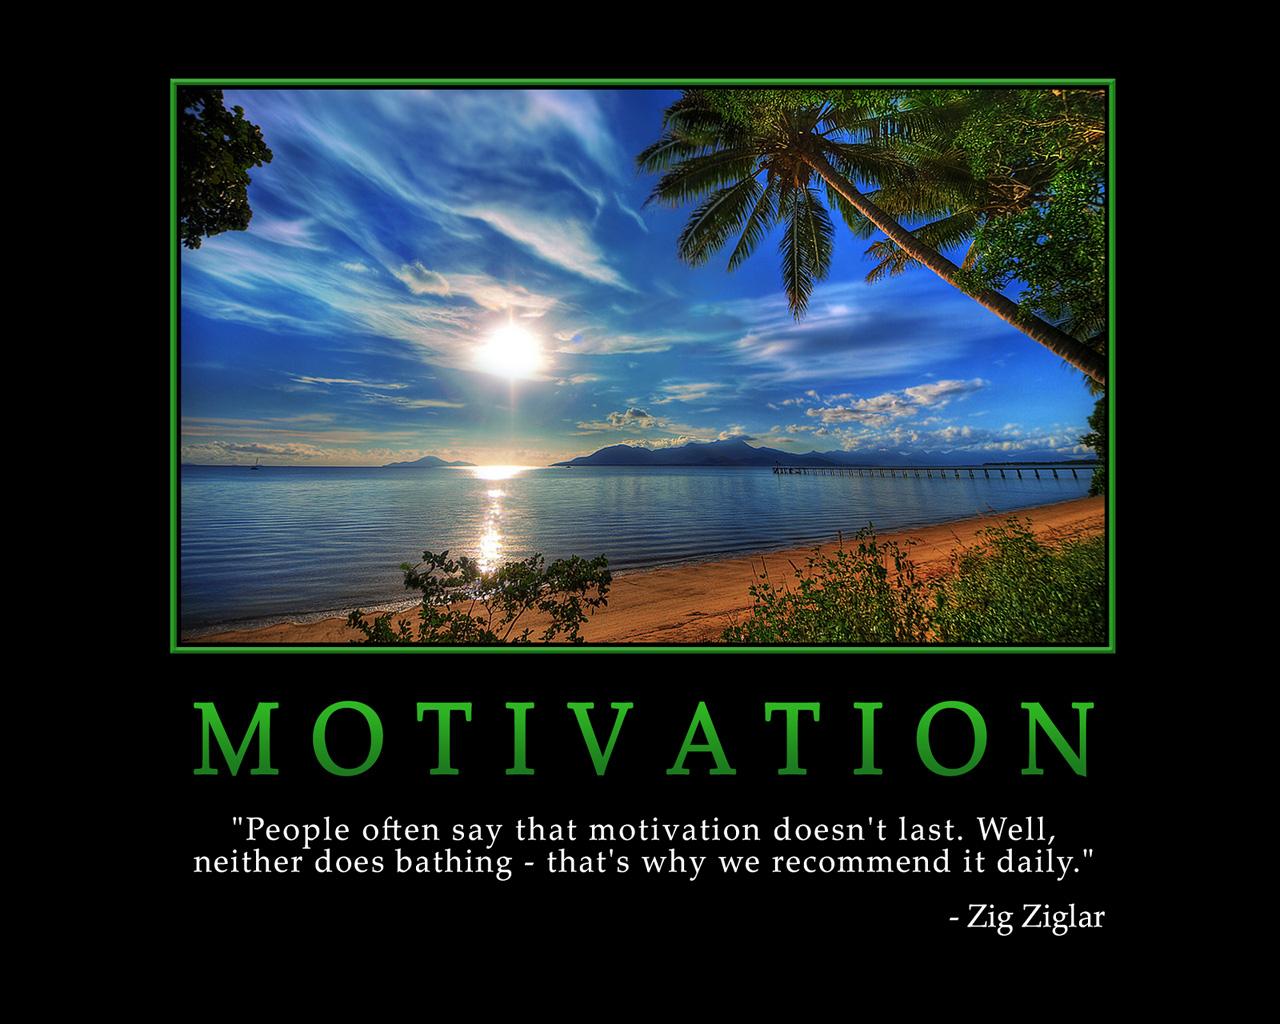 motivating inspirational motivational stories quotes